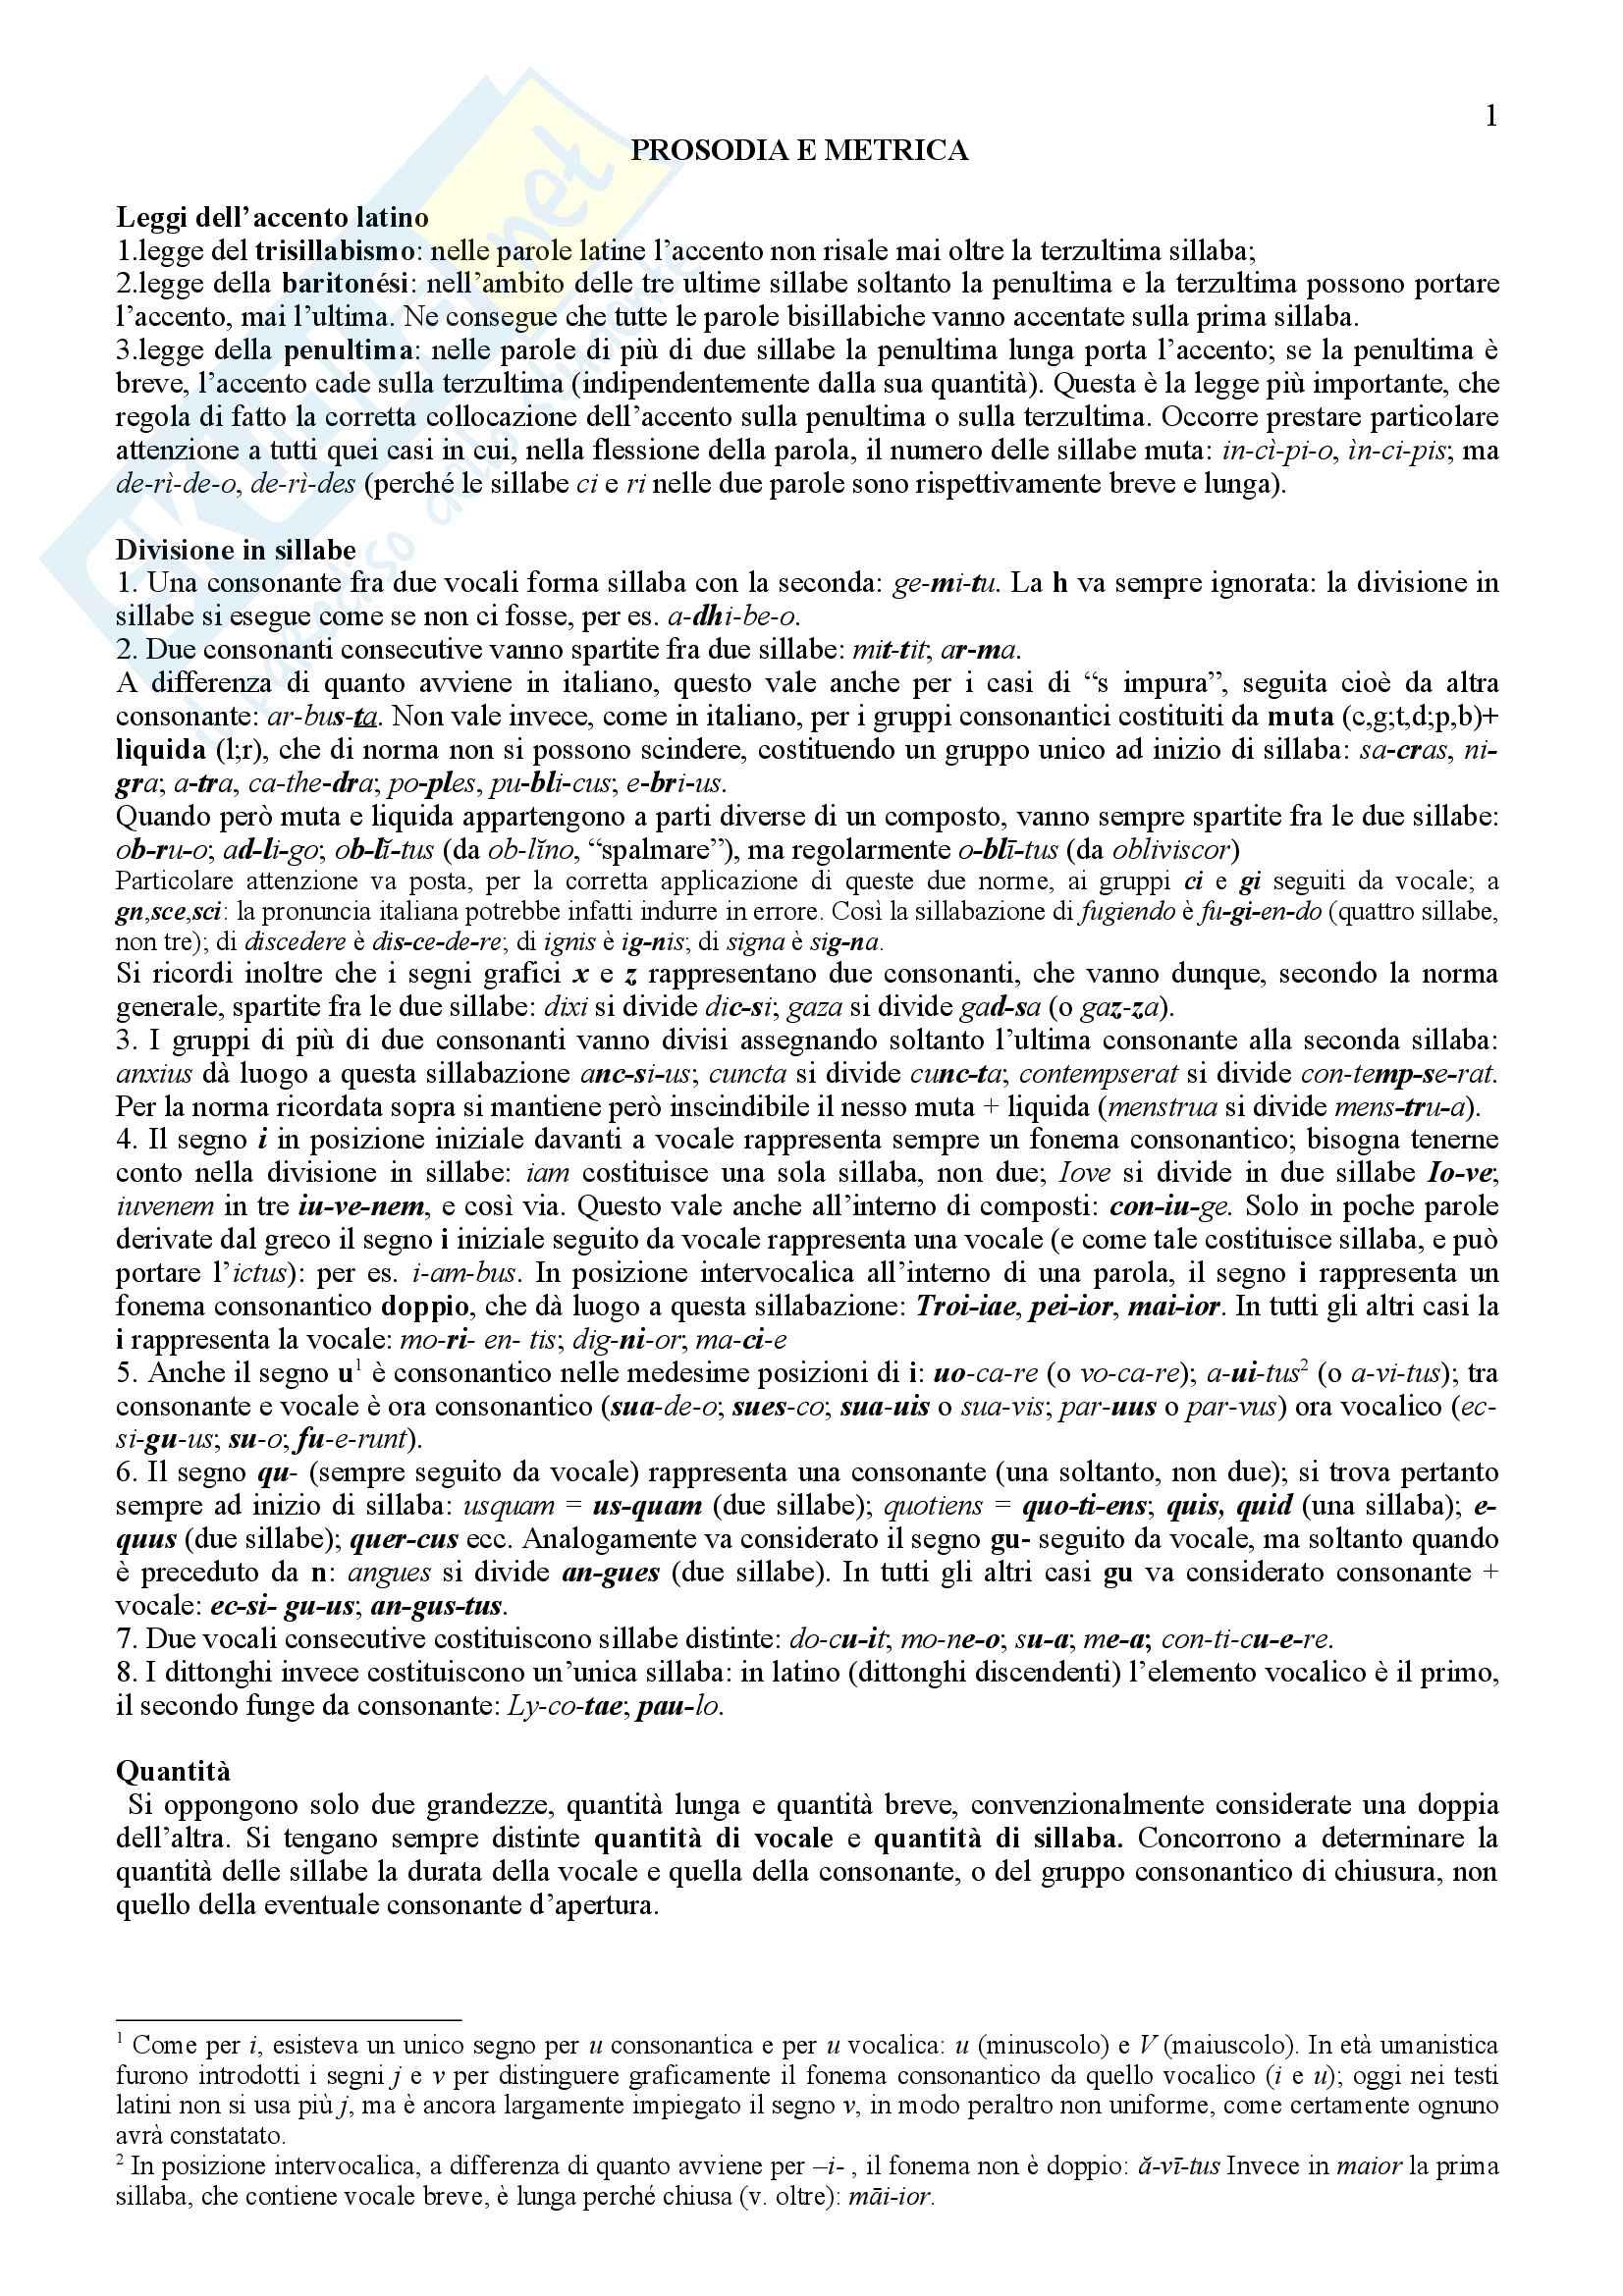 appunti di prosodia e metrica latina